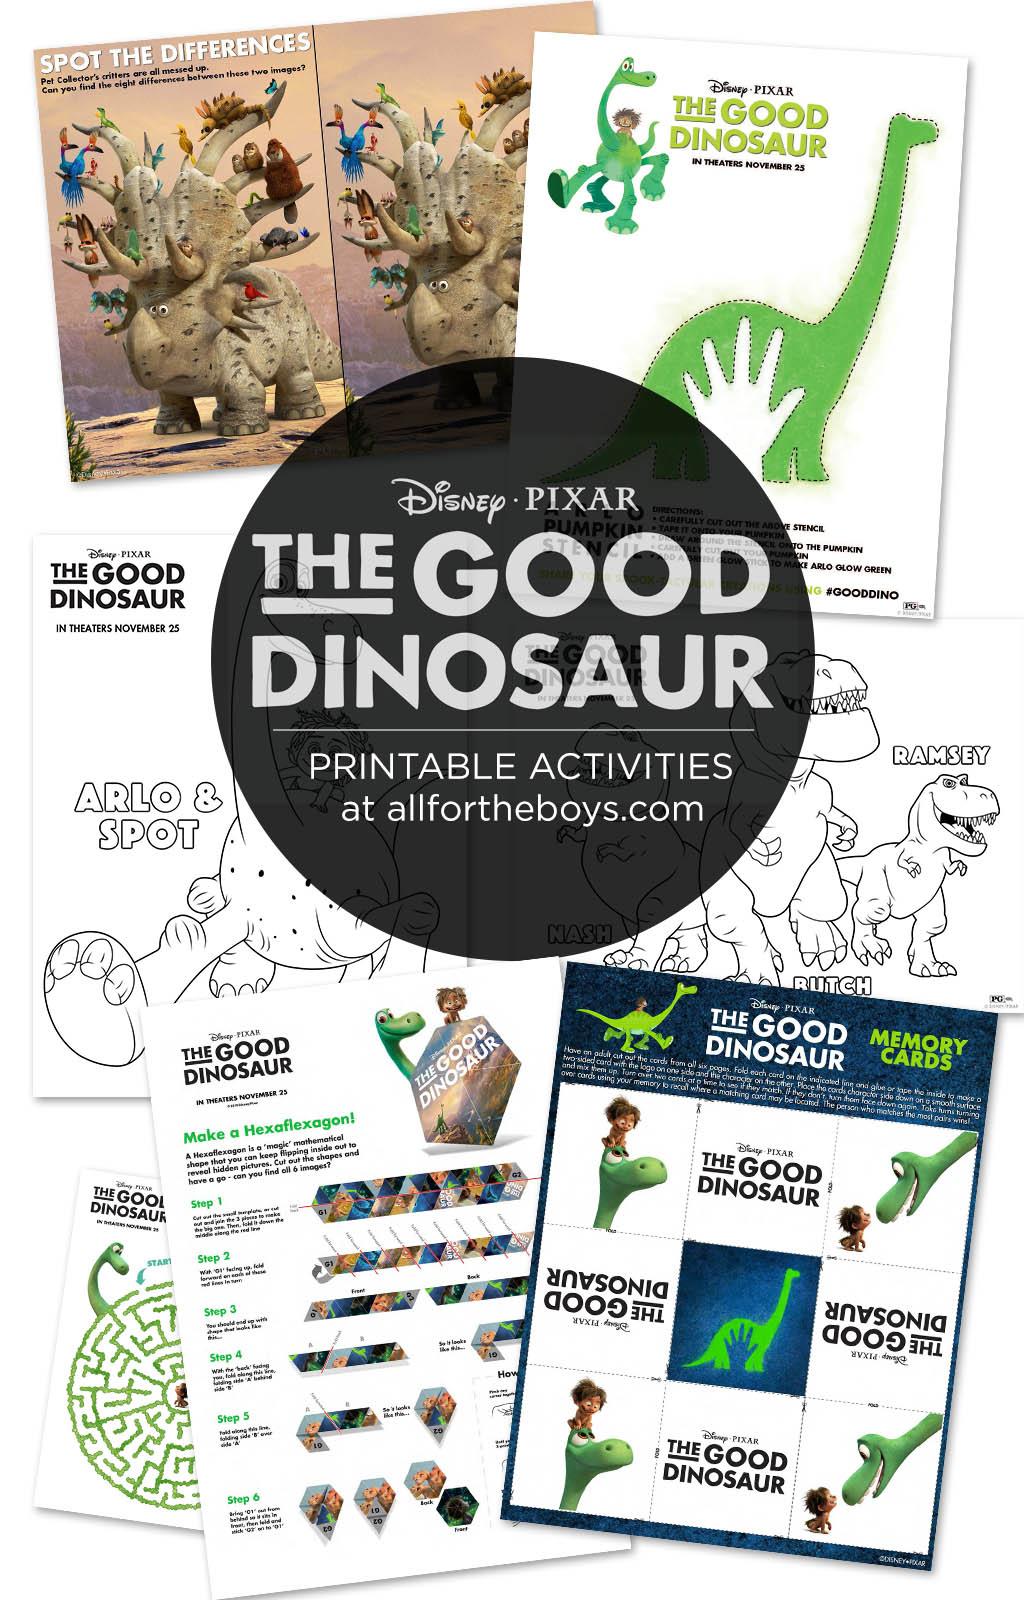 The Good Dinosaur Printable Activities